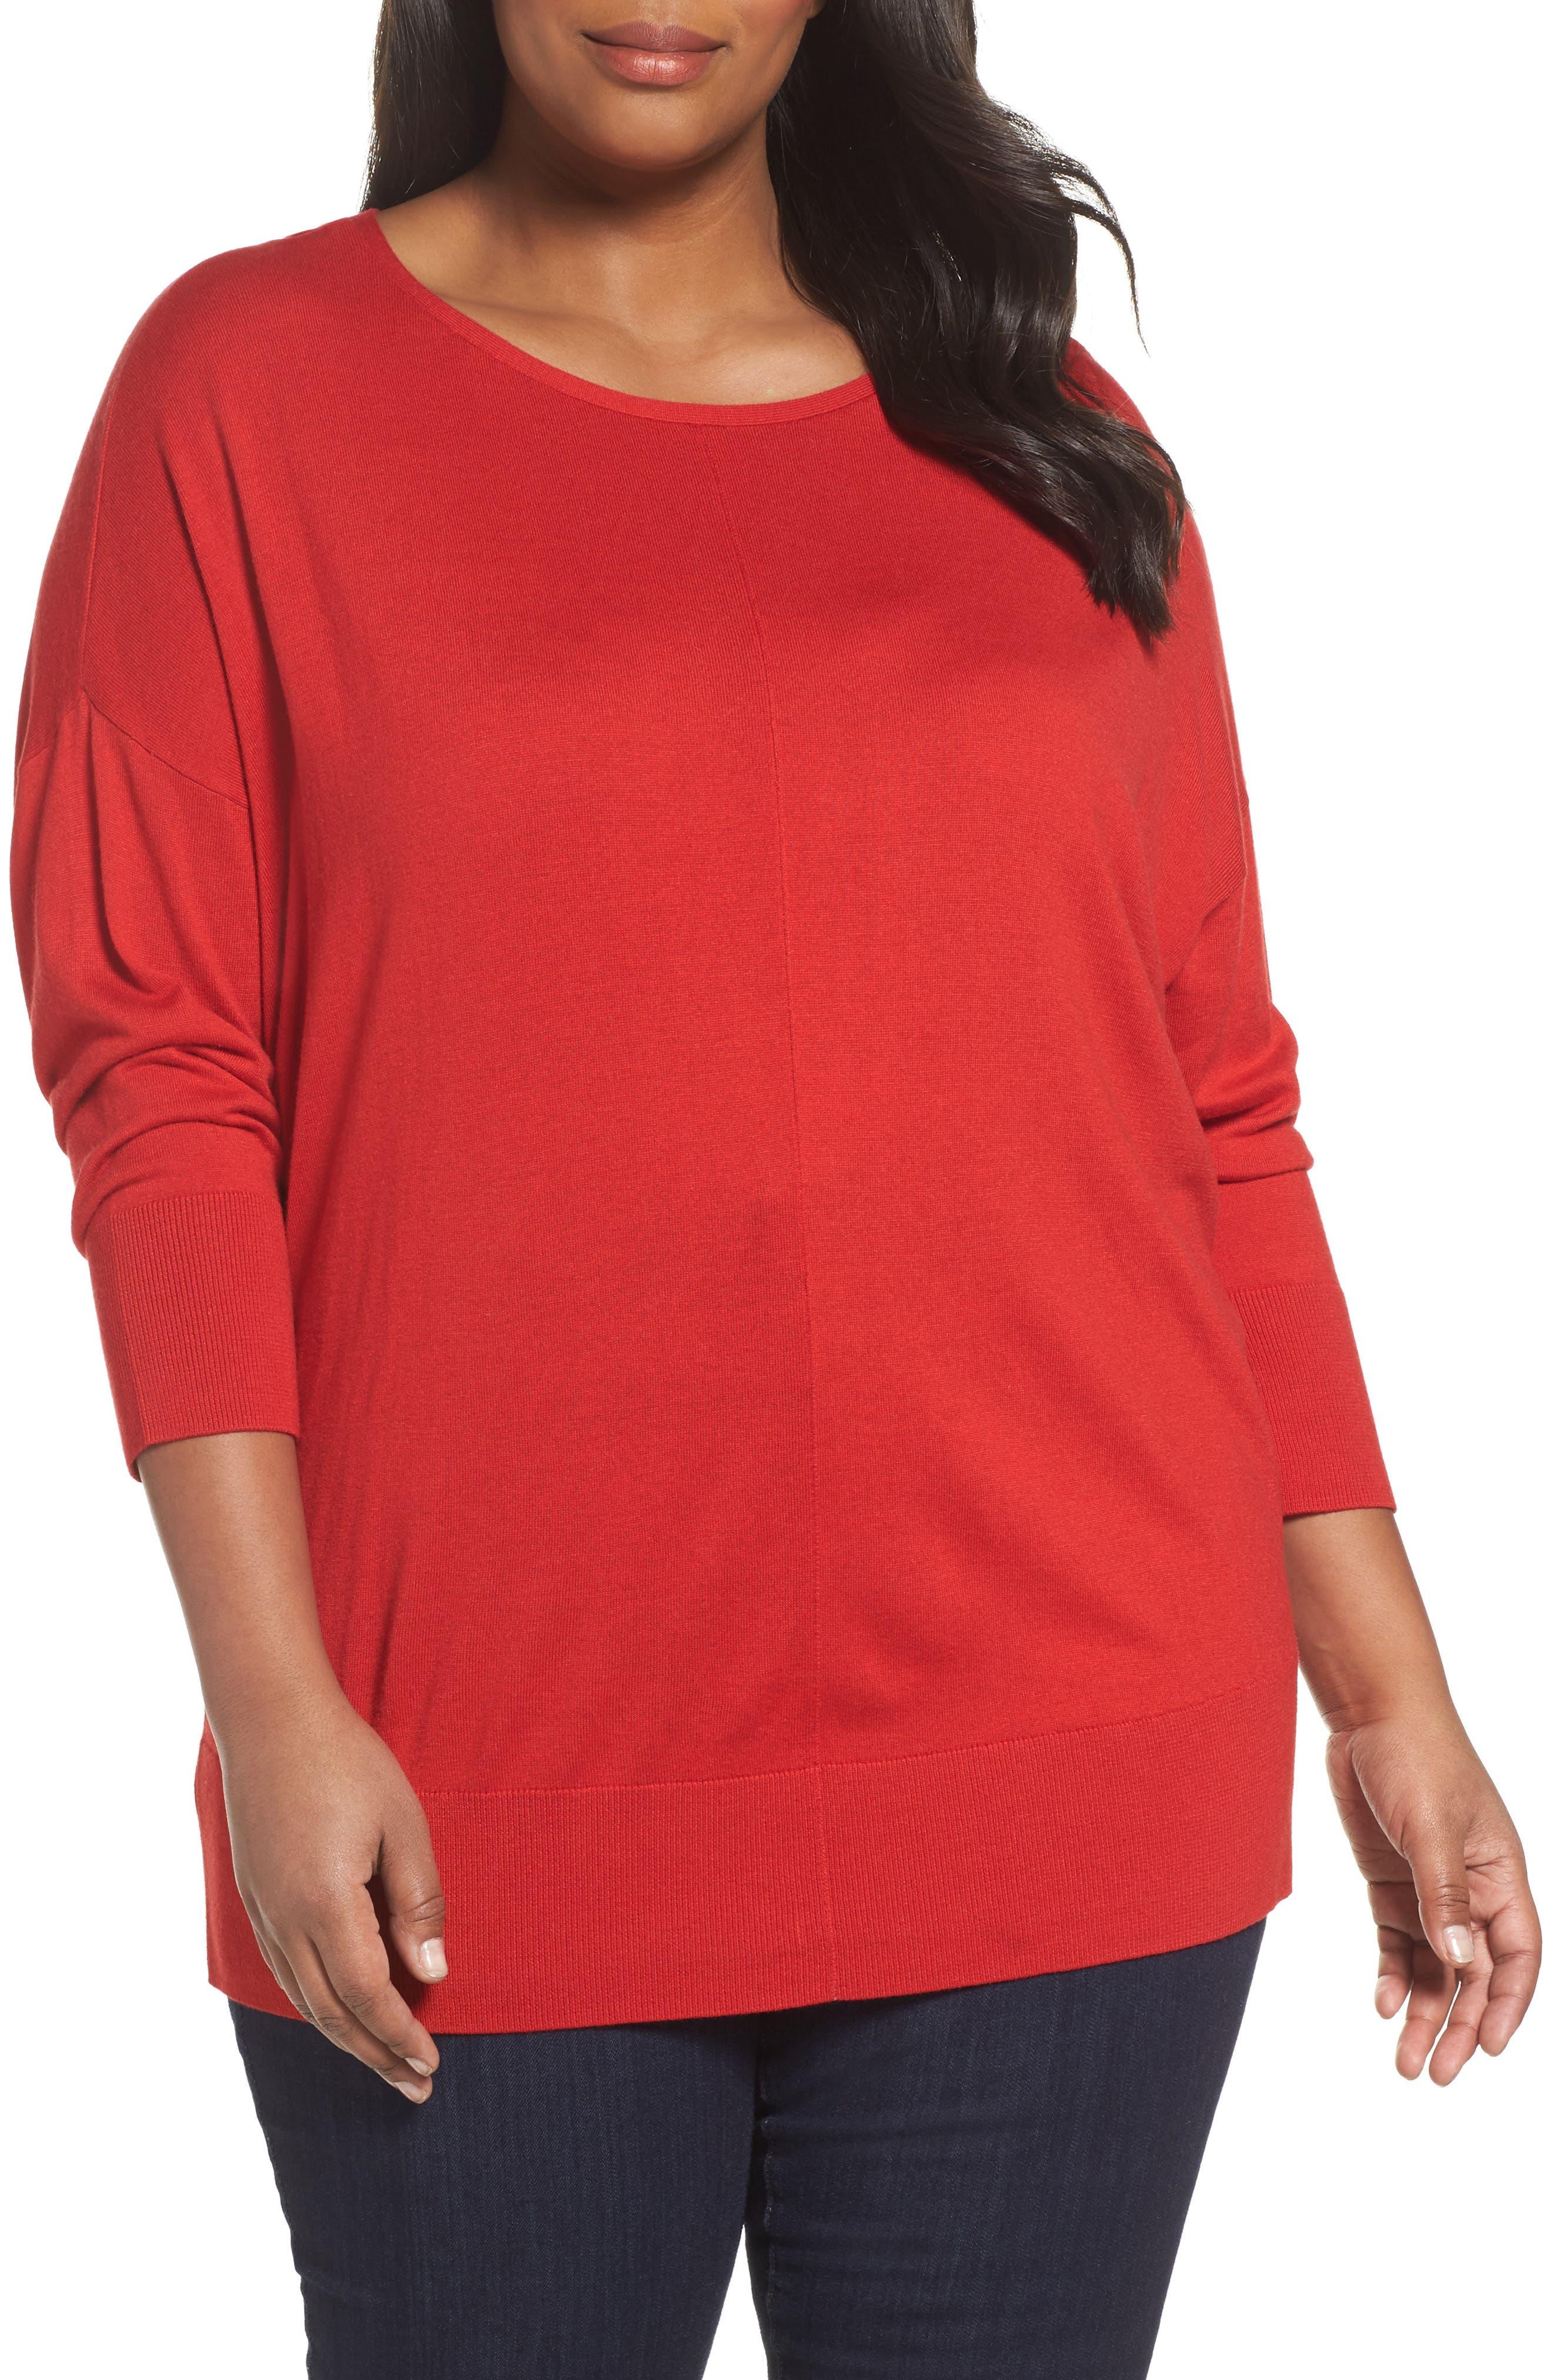 Alternate Image 1 Selected - Sejour Dolman Sleeve Sweater (Plus Size)